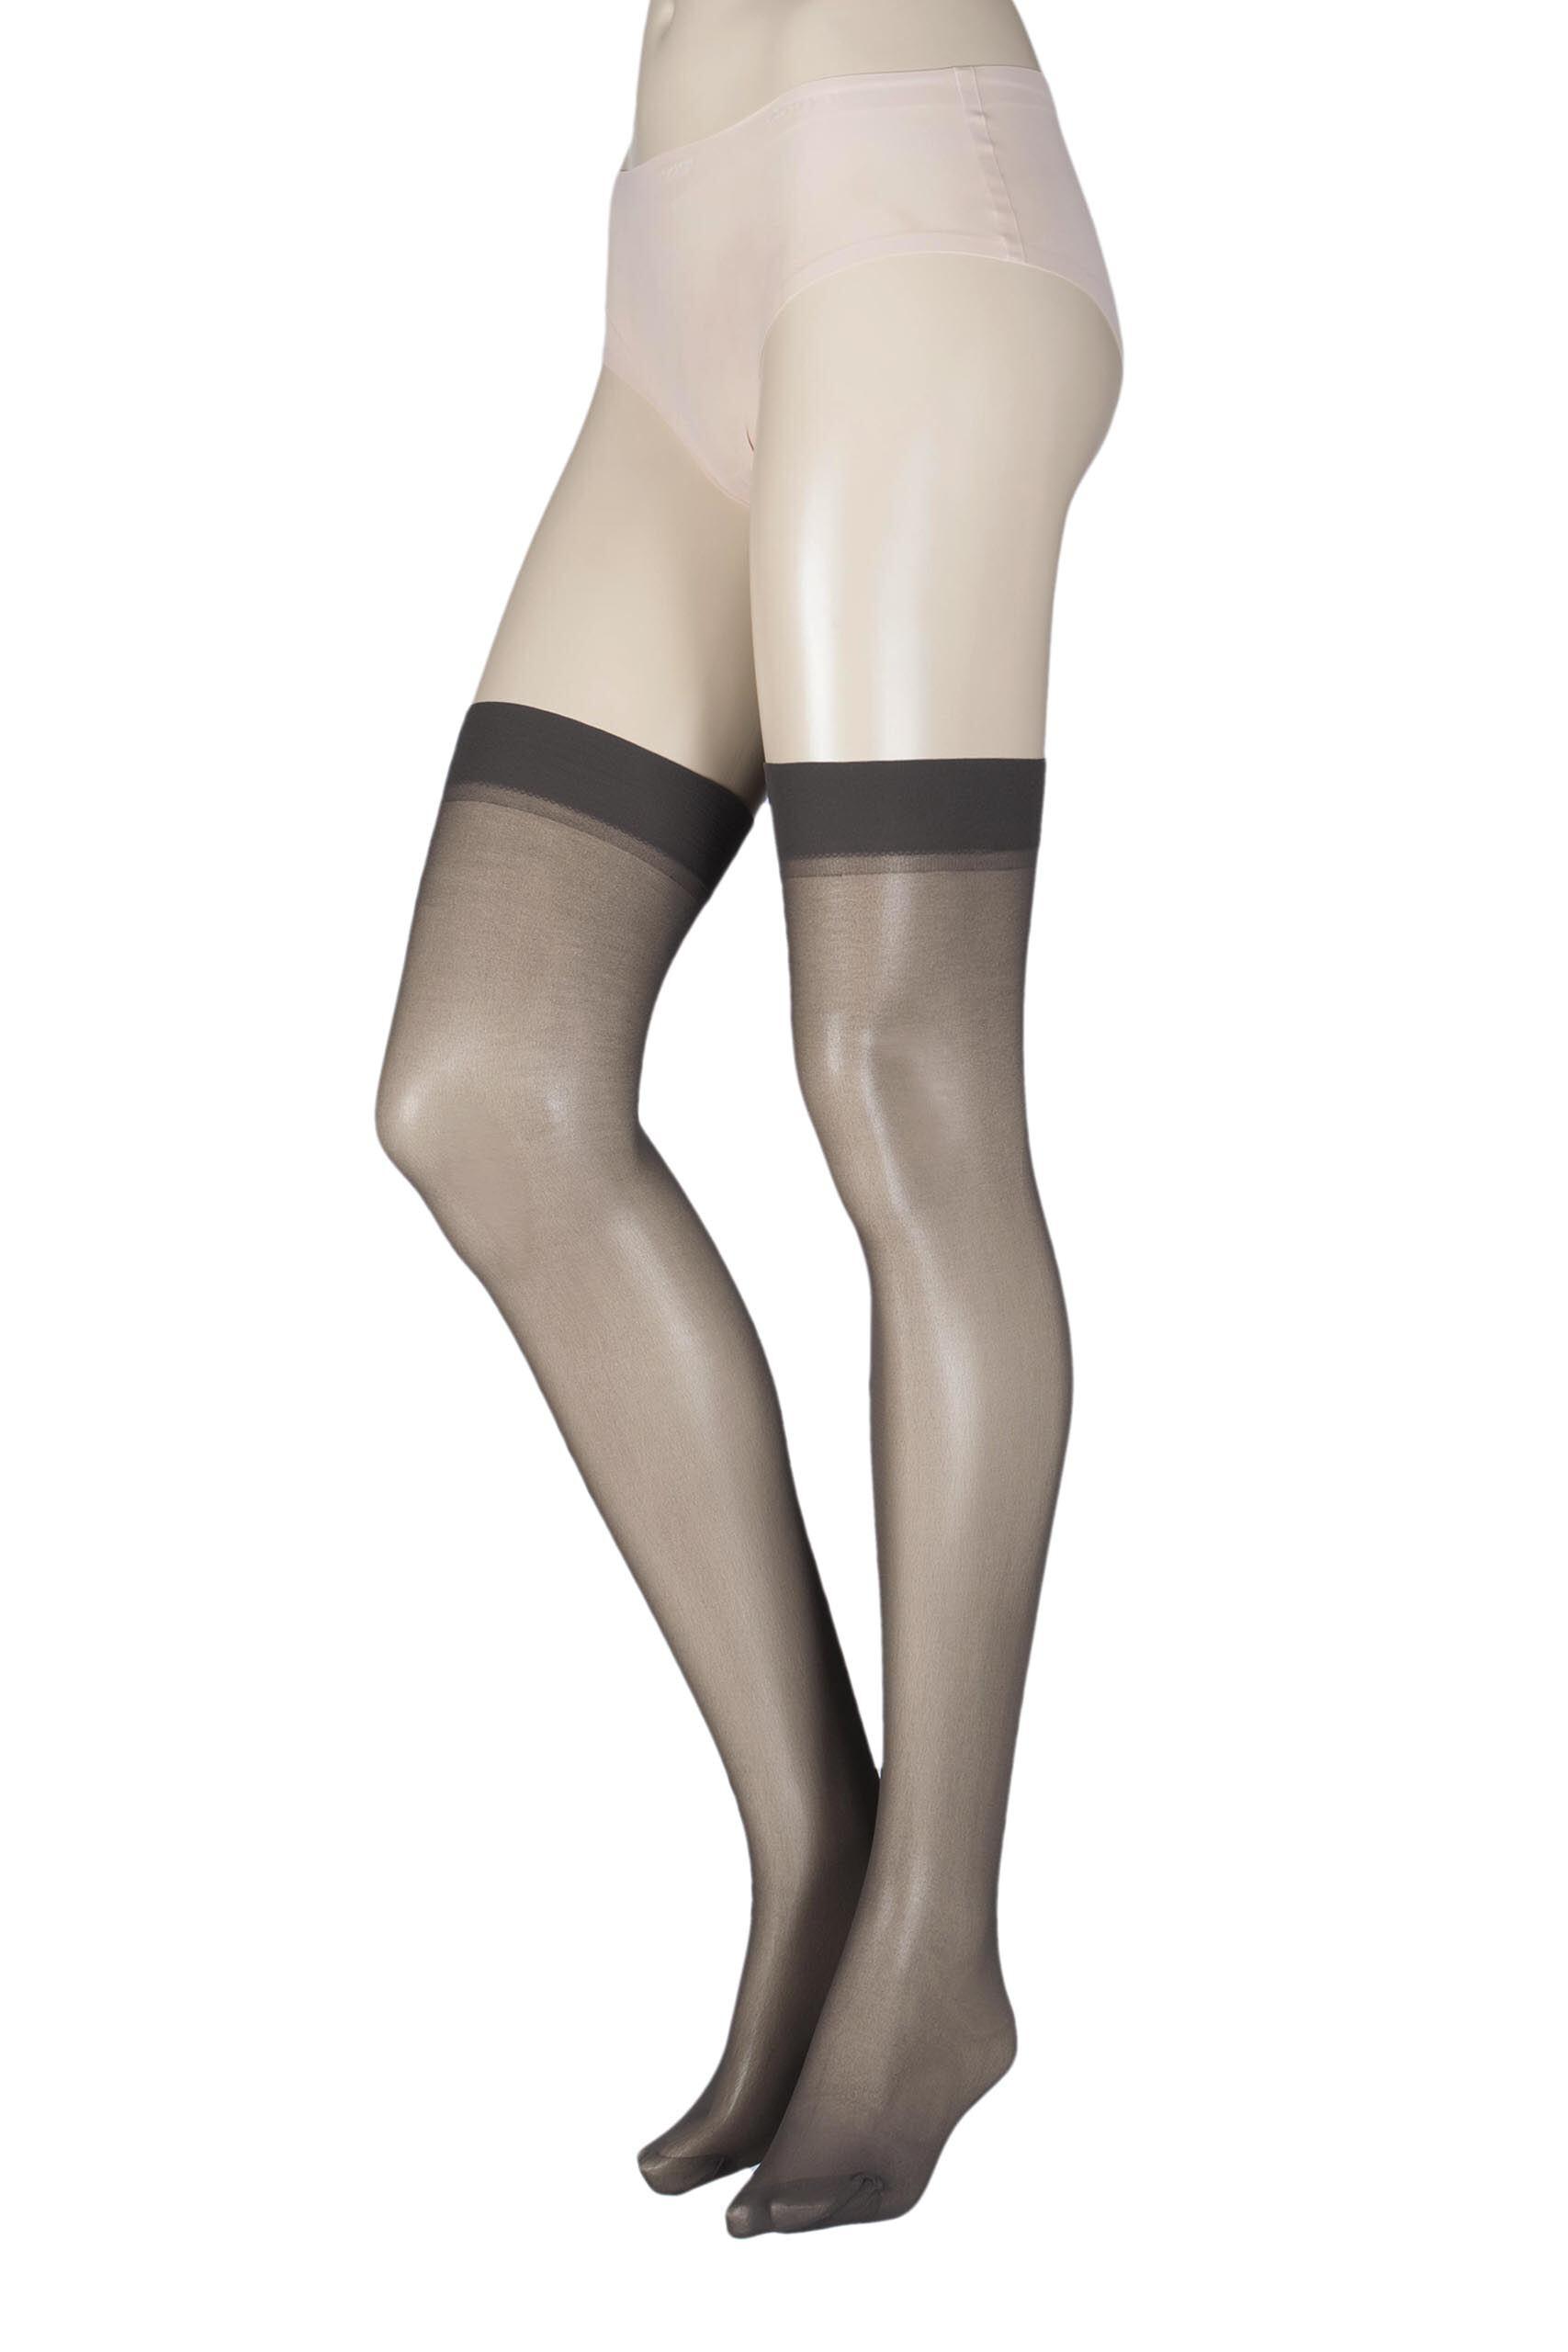 Image of 1 Pair Barely Black Stockings 20 Denier 100% Nylon Ladies One Size - Elle